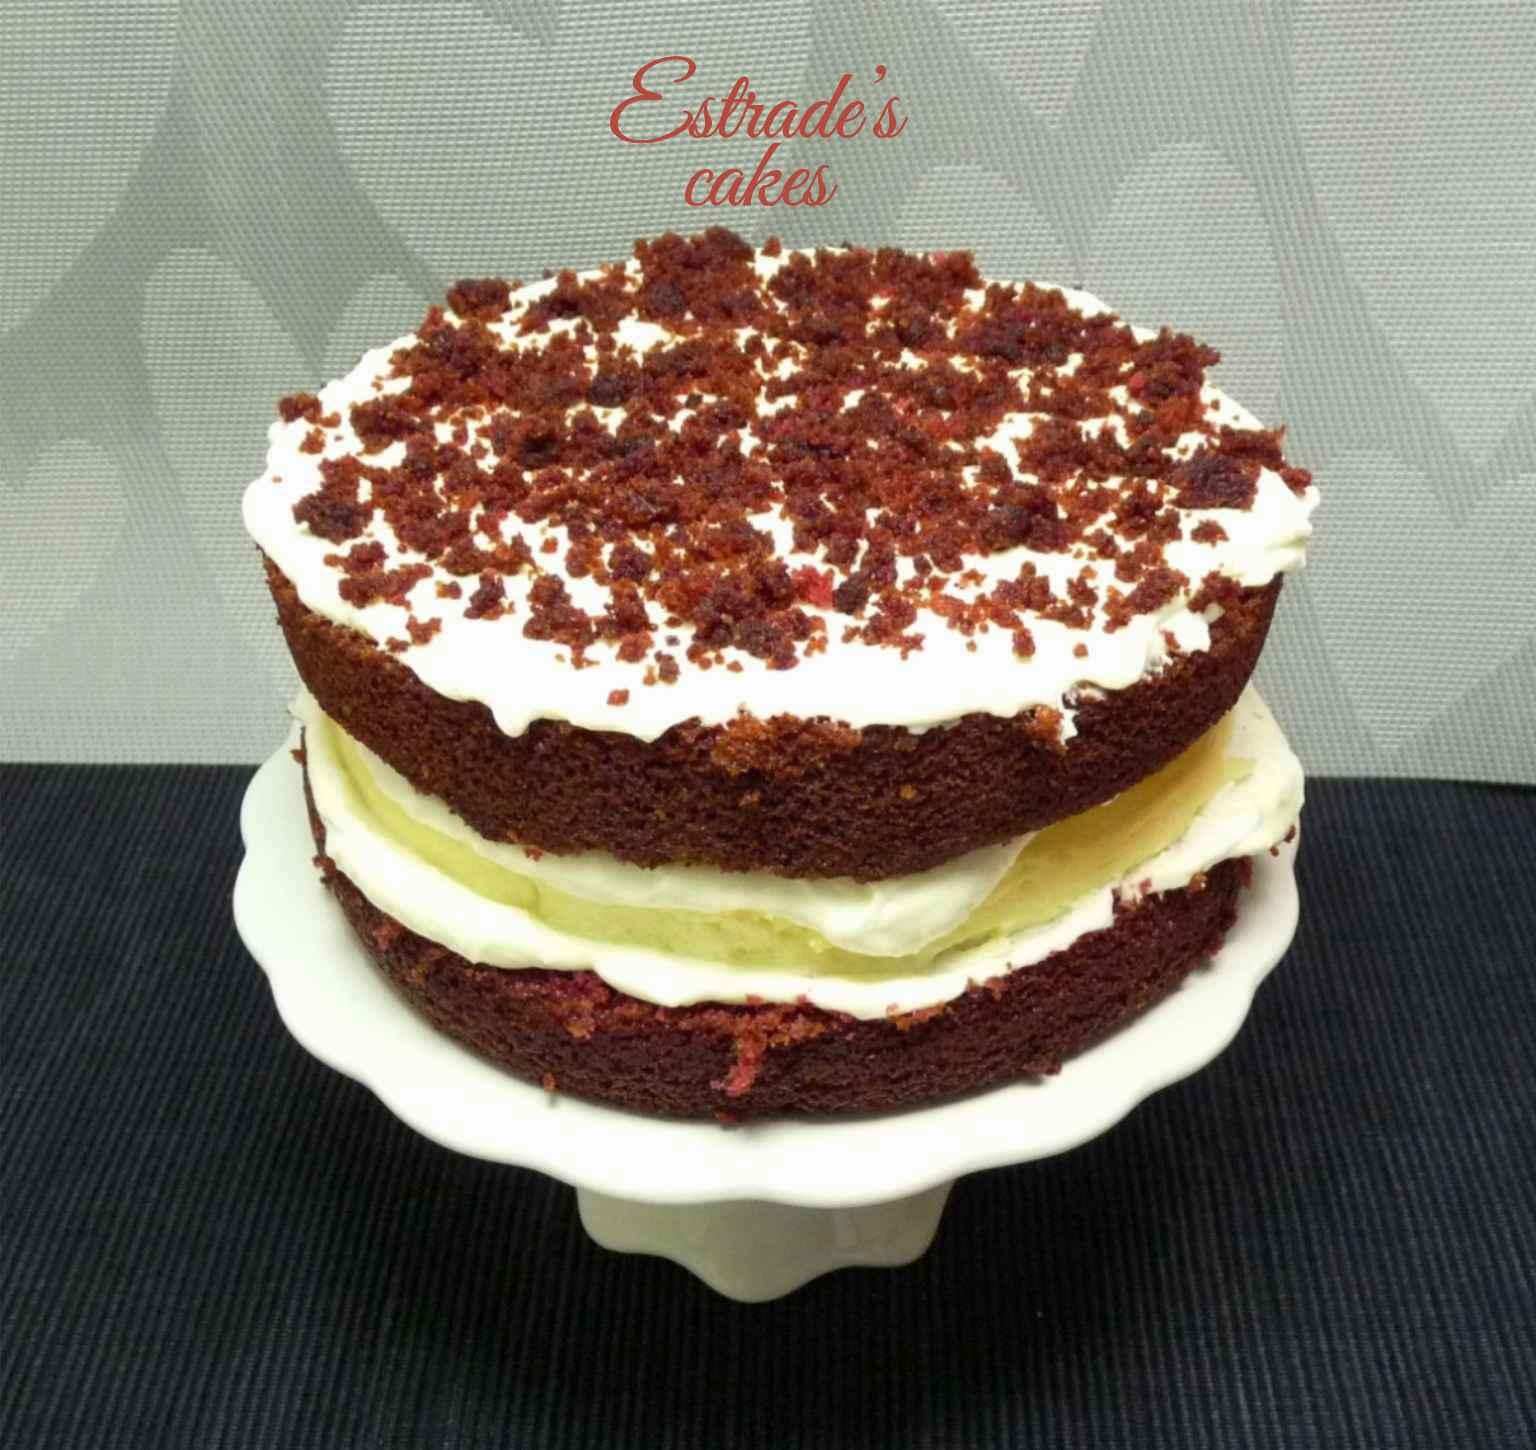 redvelvet cheesecake - 8